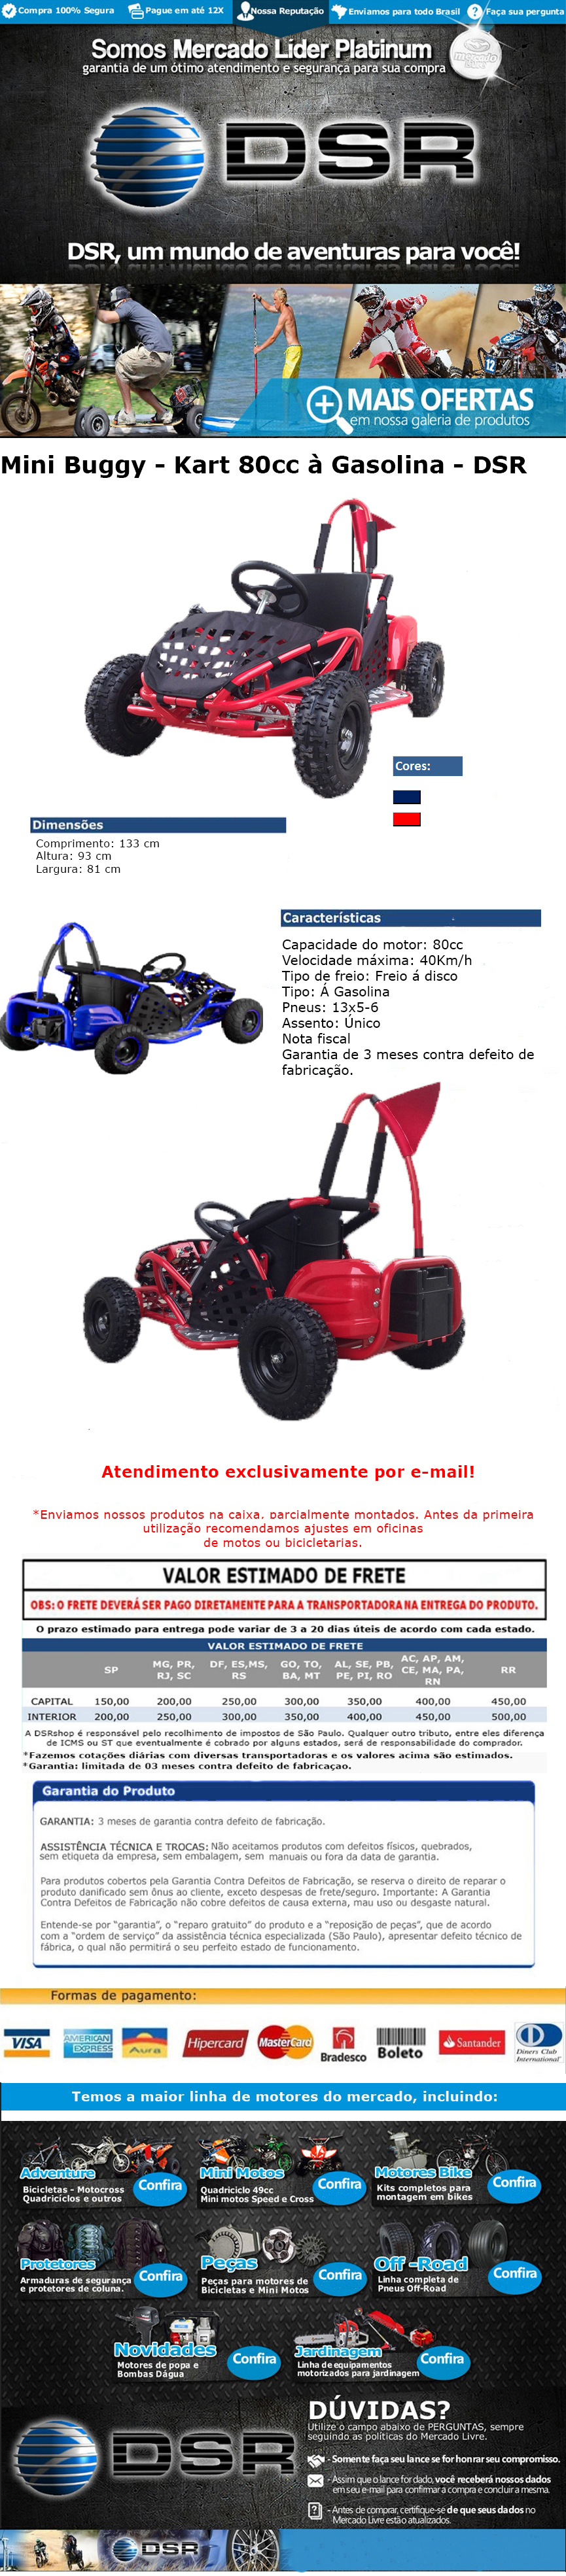 buggy80cc